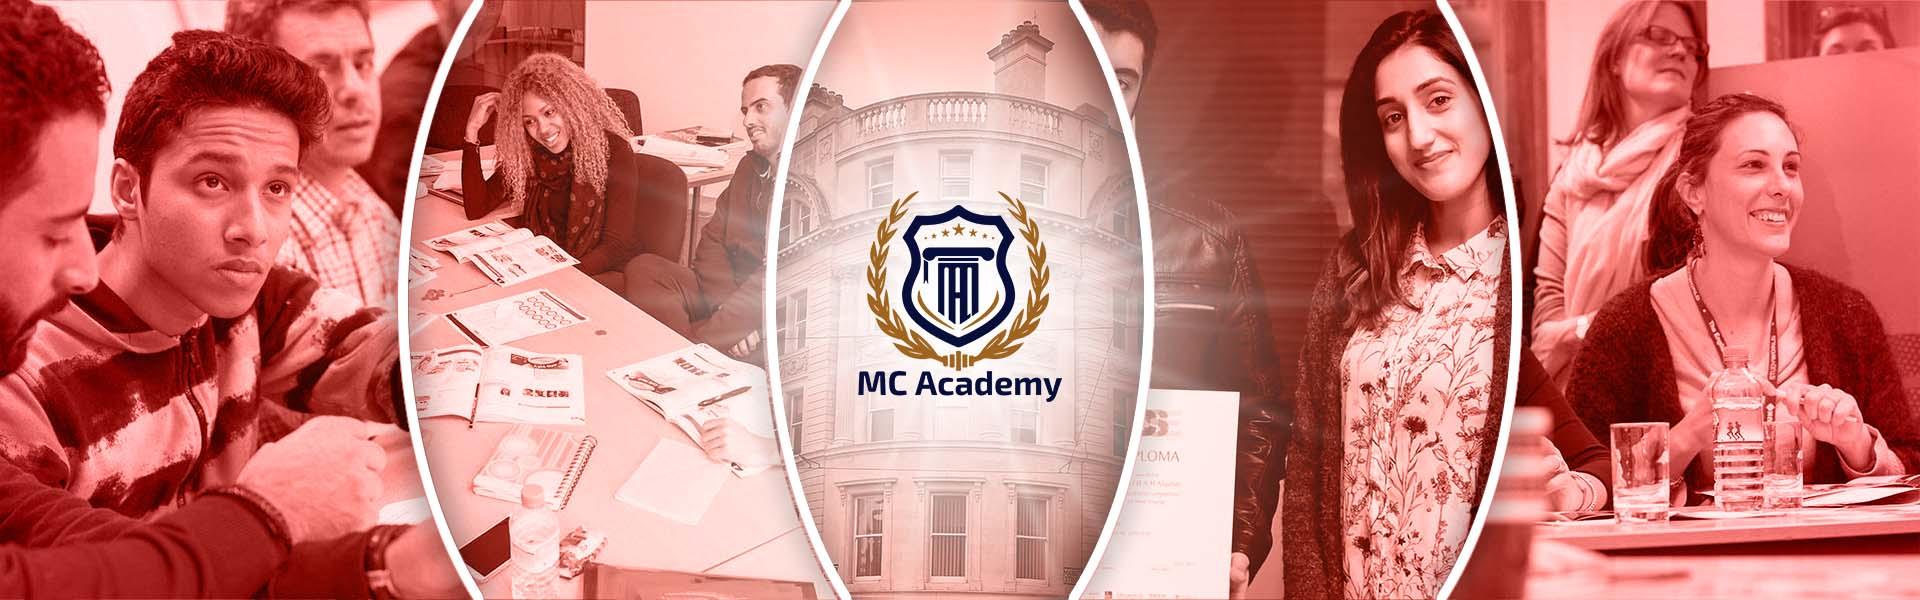 MC Academy Manchester Dil Okulu